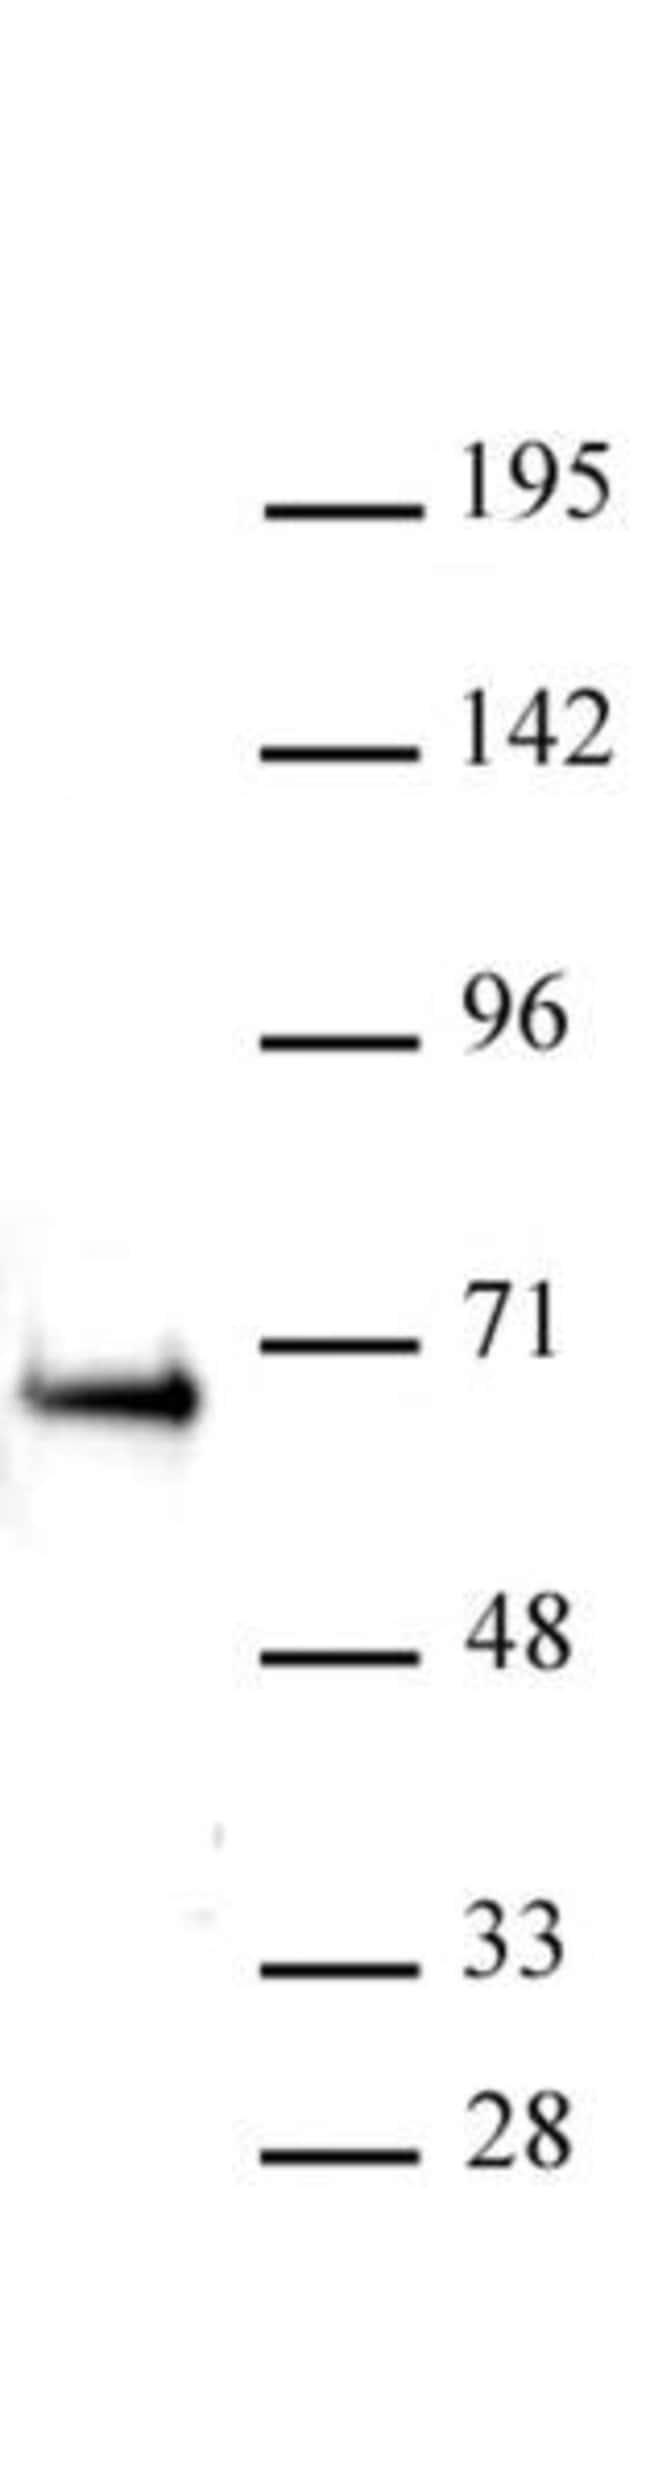 ETO / RUNX1T1 Rabbit anti-Human, Unconjugated, Polyclonal, Active Motif:Antibodies:Primary